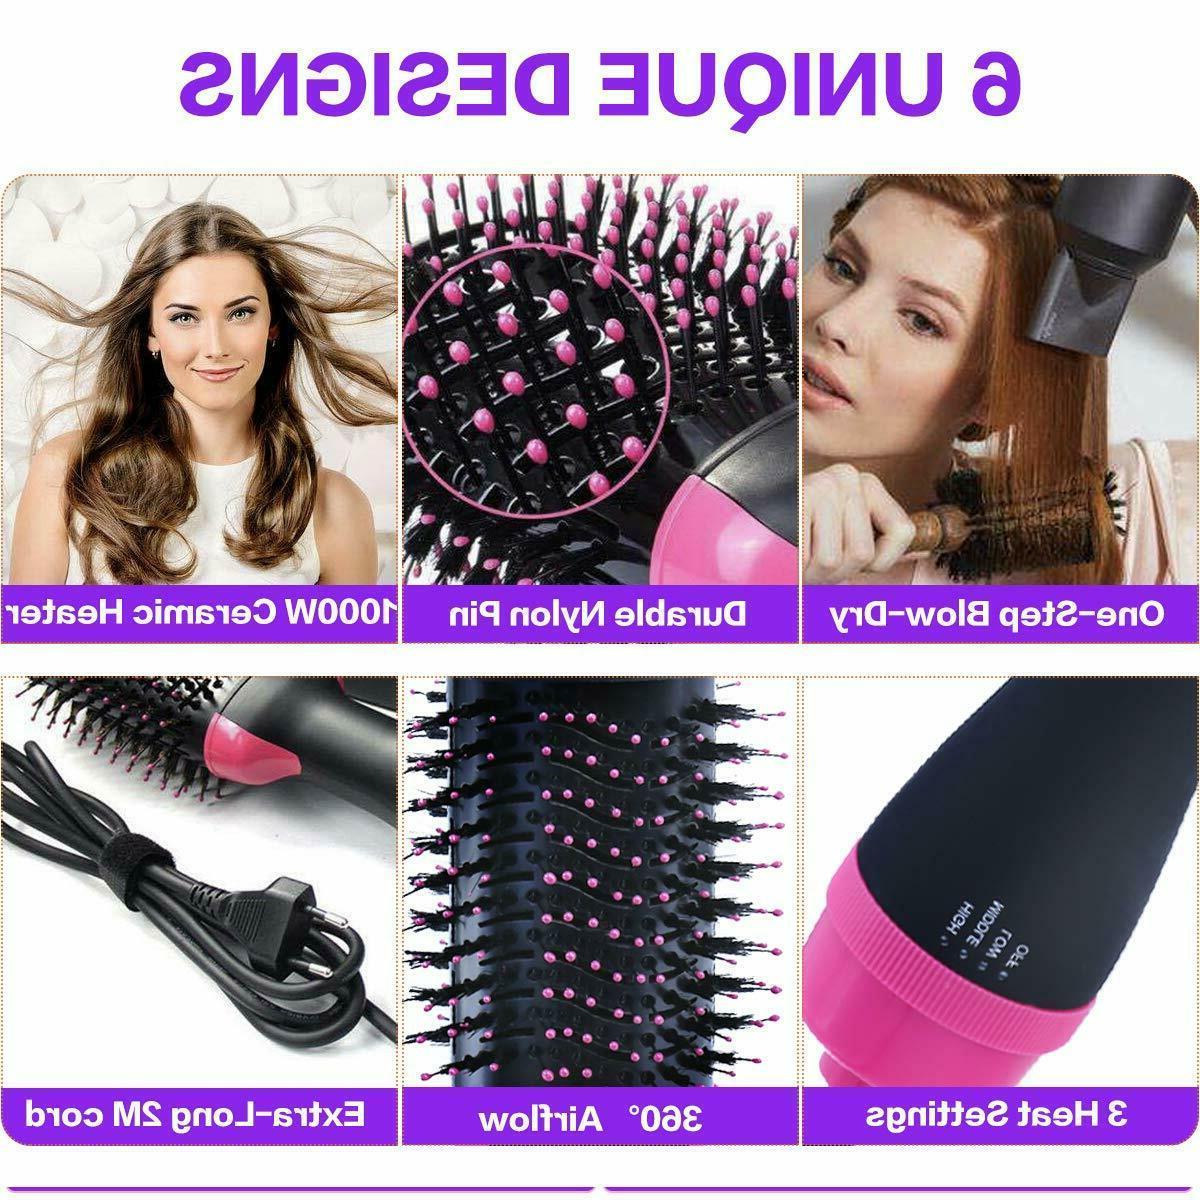 4 Hot Air Multi-function Straight Hair Curling Dryer